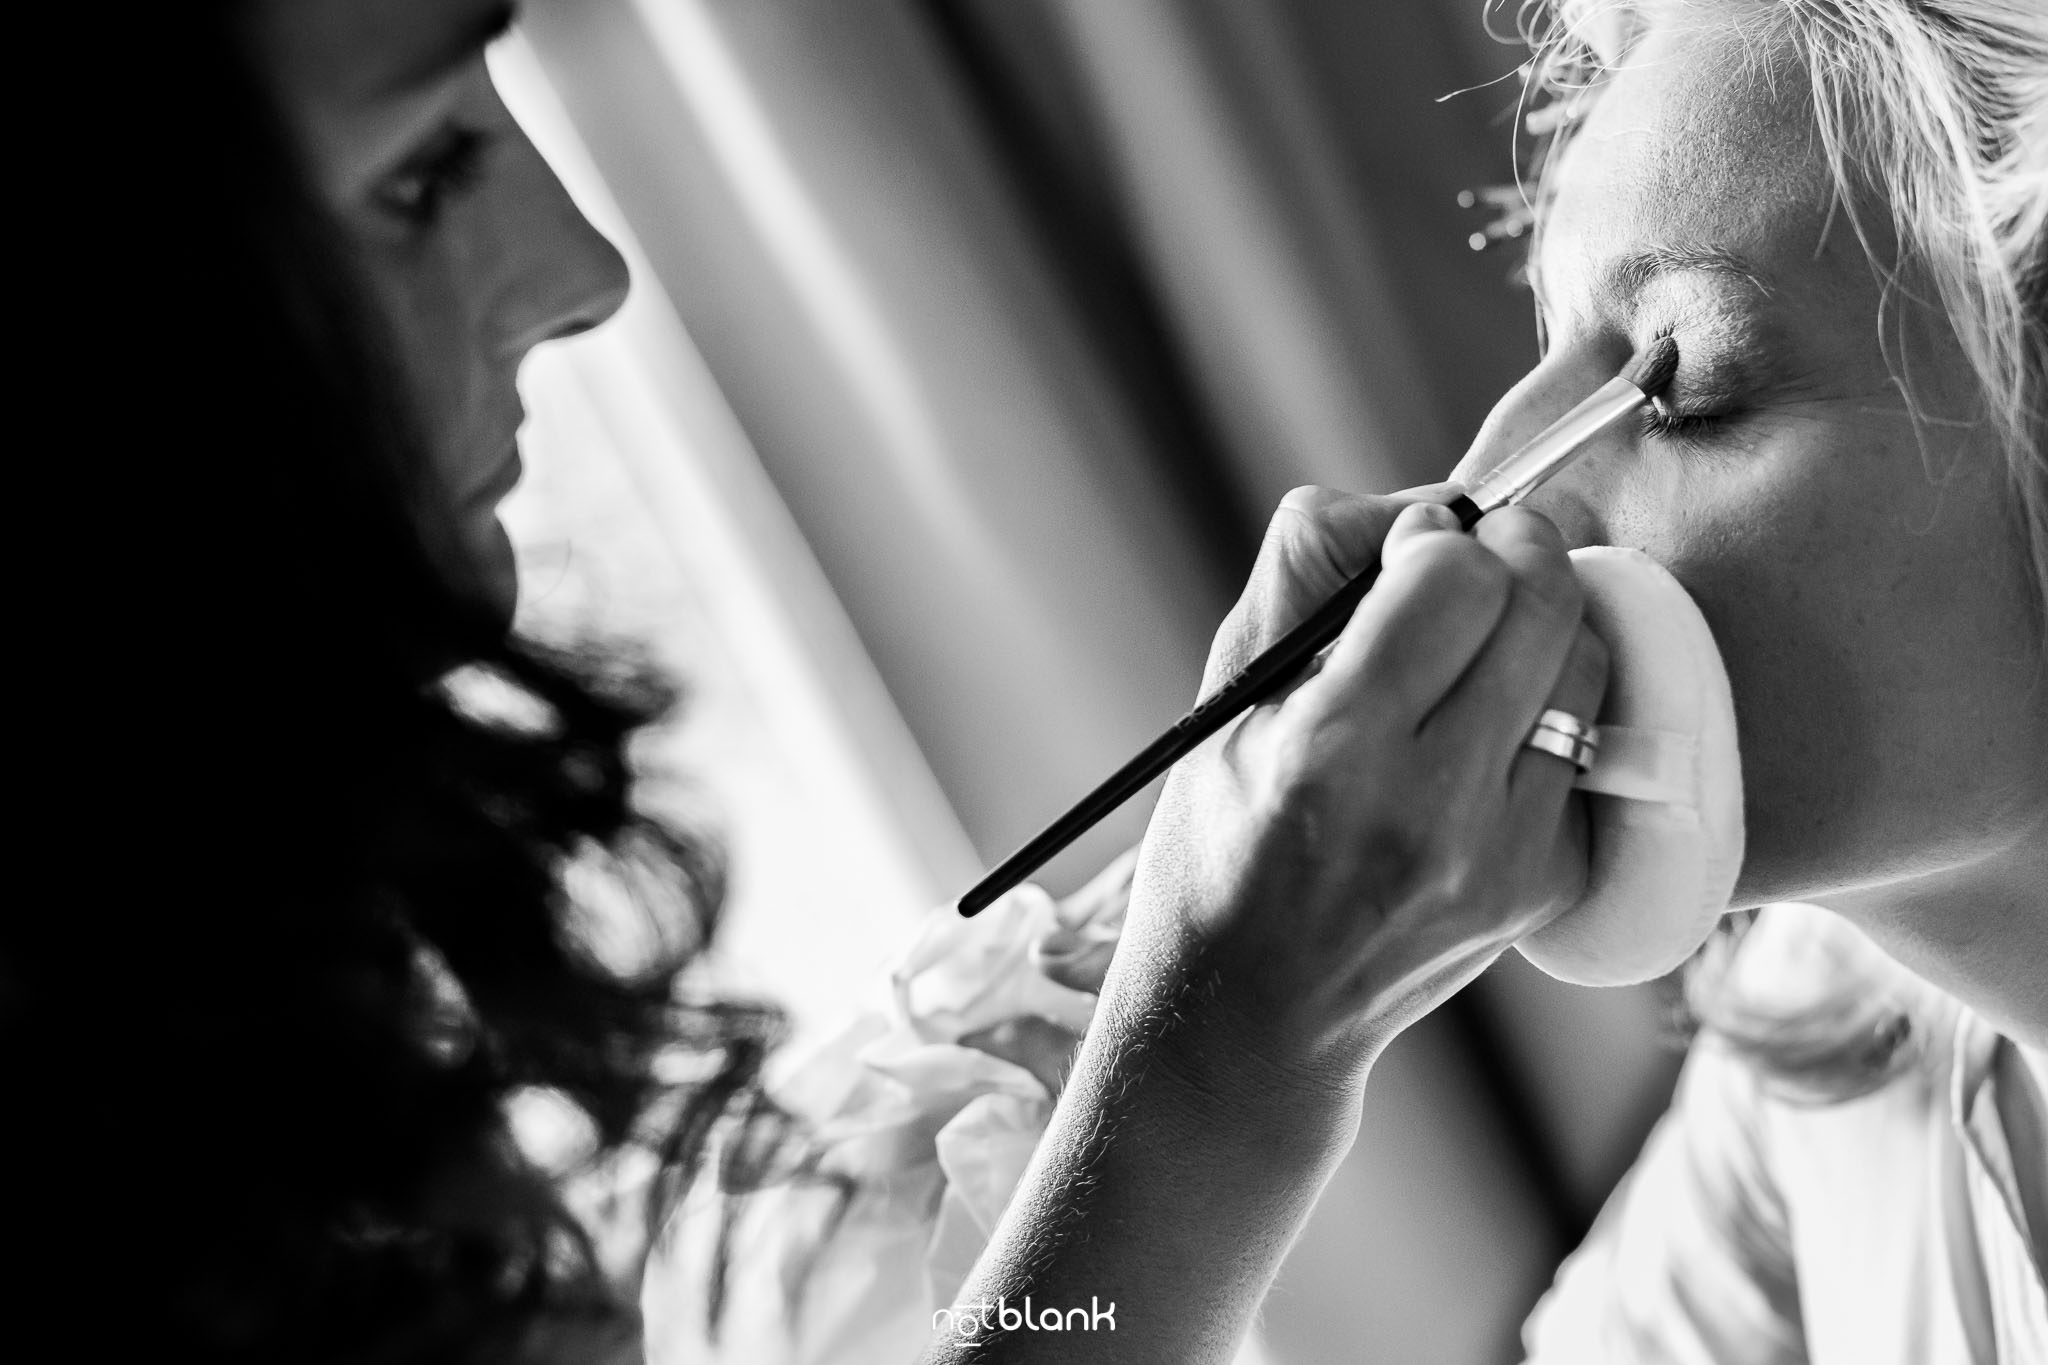 notblank-boda-Fotógrafos-de-boda-Parador Baiona-Bayona-Maquillaje-Maquilladora-Novia-Preparativos